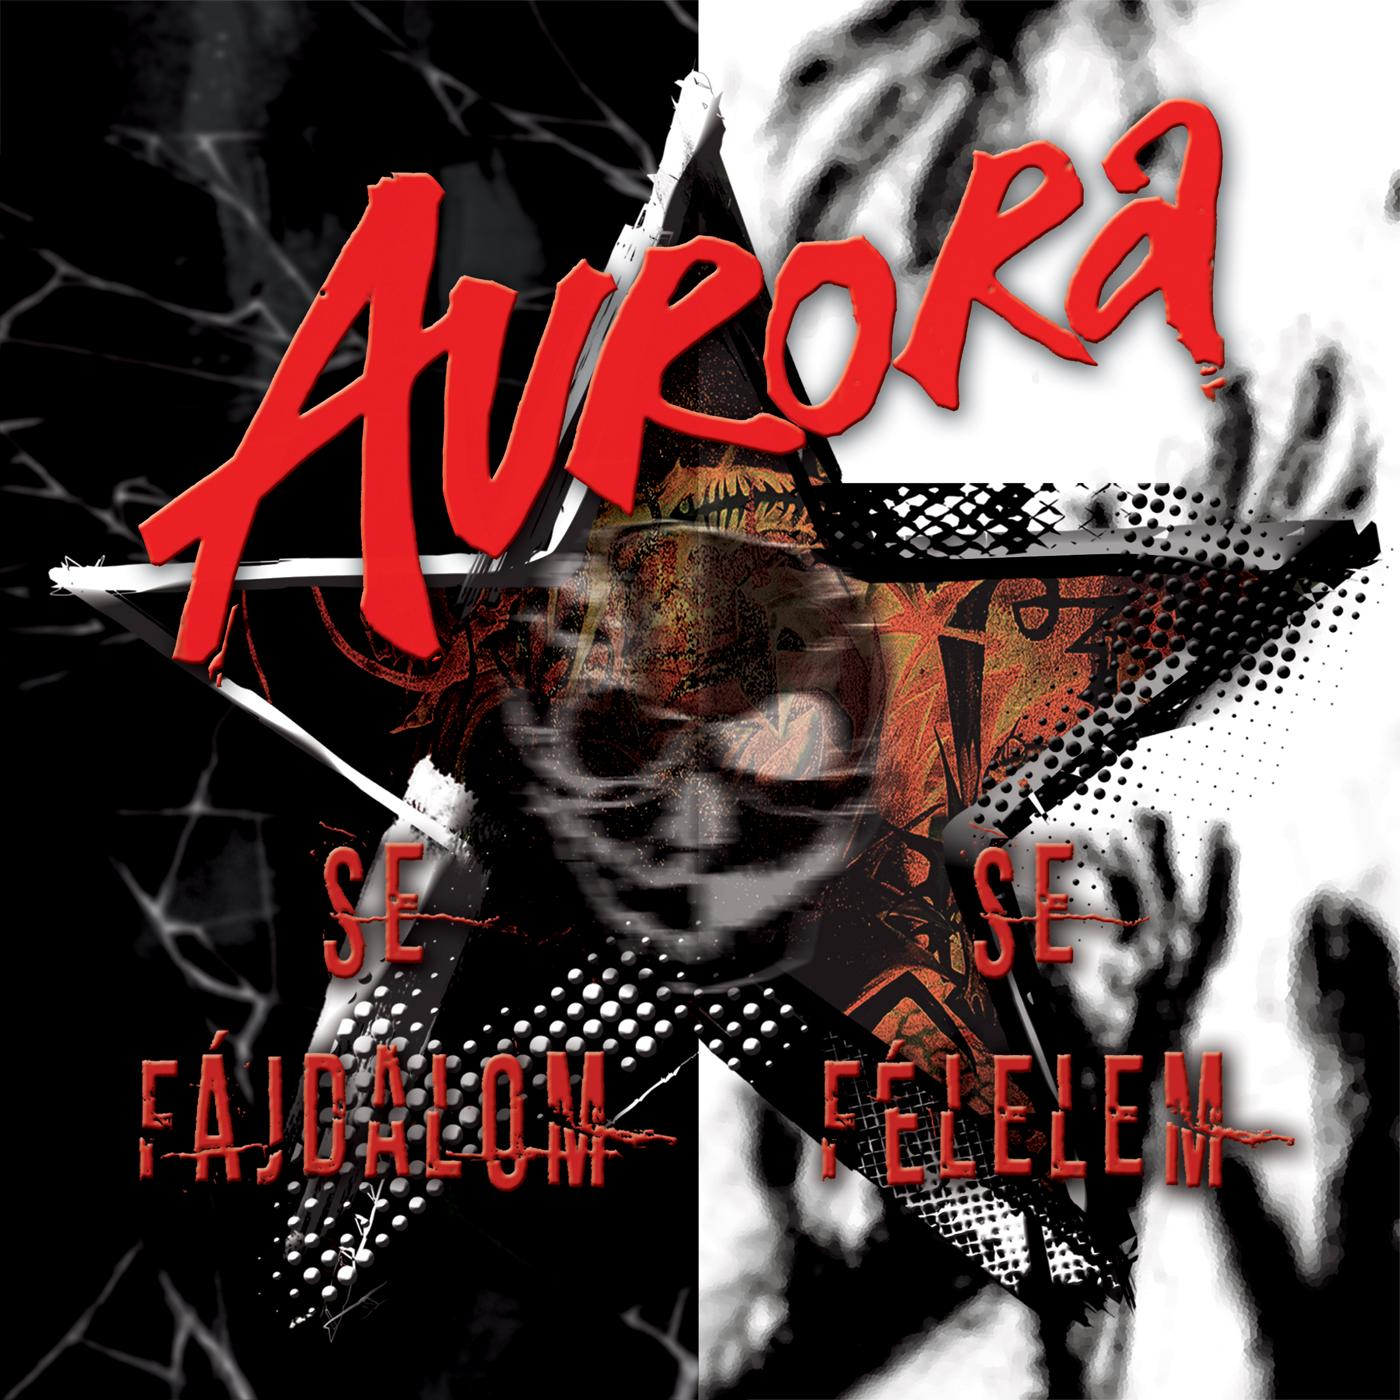 AURORA - SE FÁJDALOM, SE FÉLELEM - AURORA - 2CD -